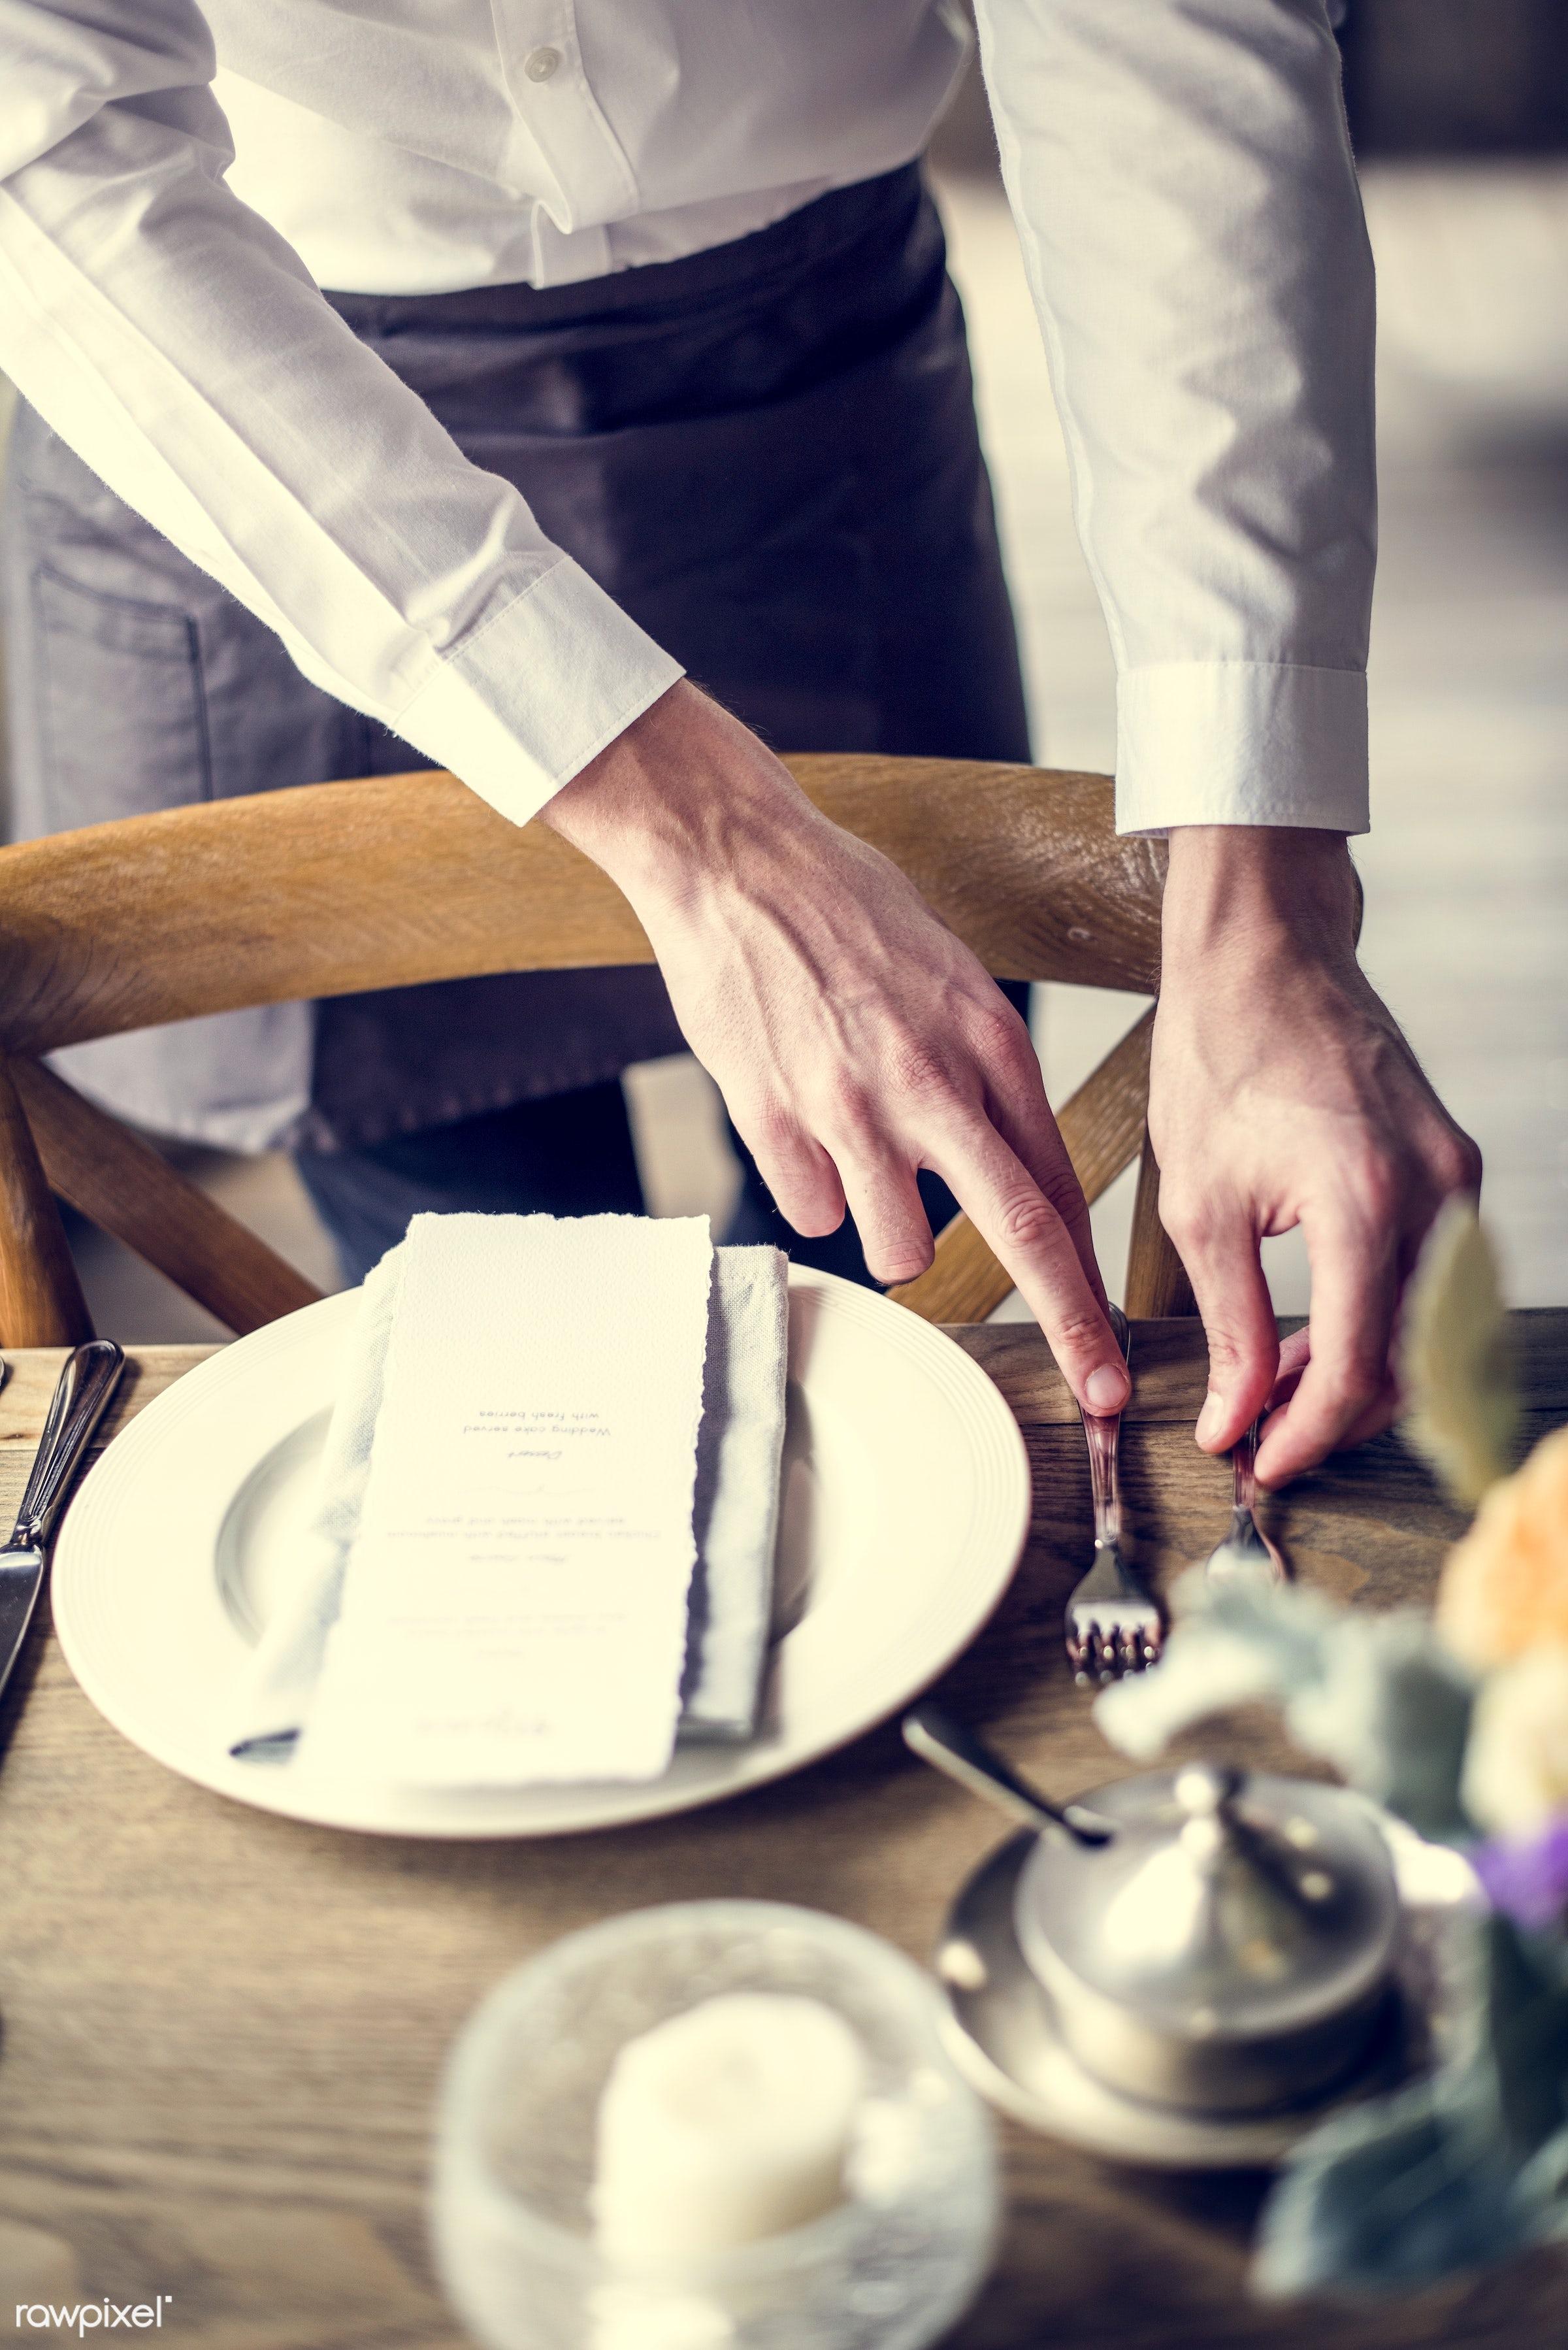 dish, person, cuisine, restaurant, people, butler, waiter, man, knife, gourmet, meal, fork, preparation, menu, plate,...